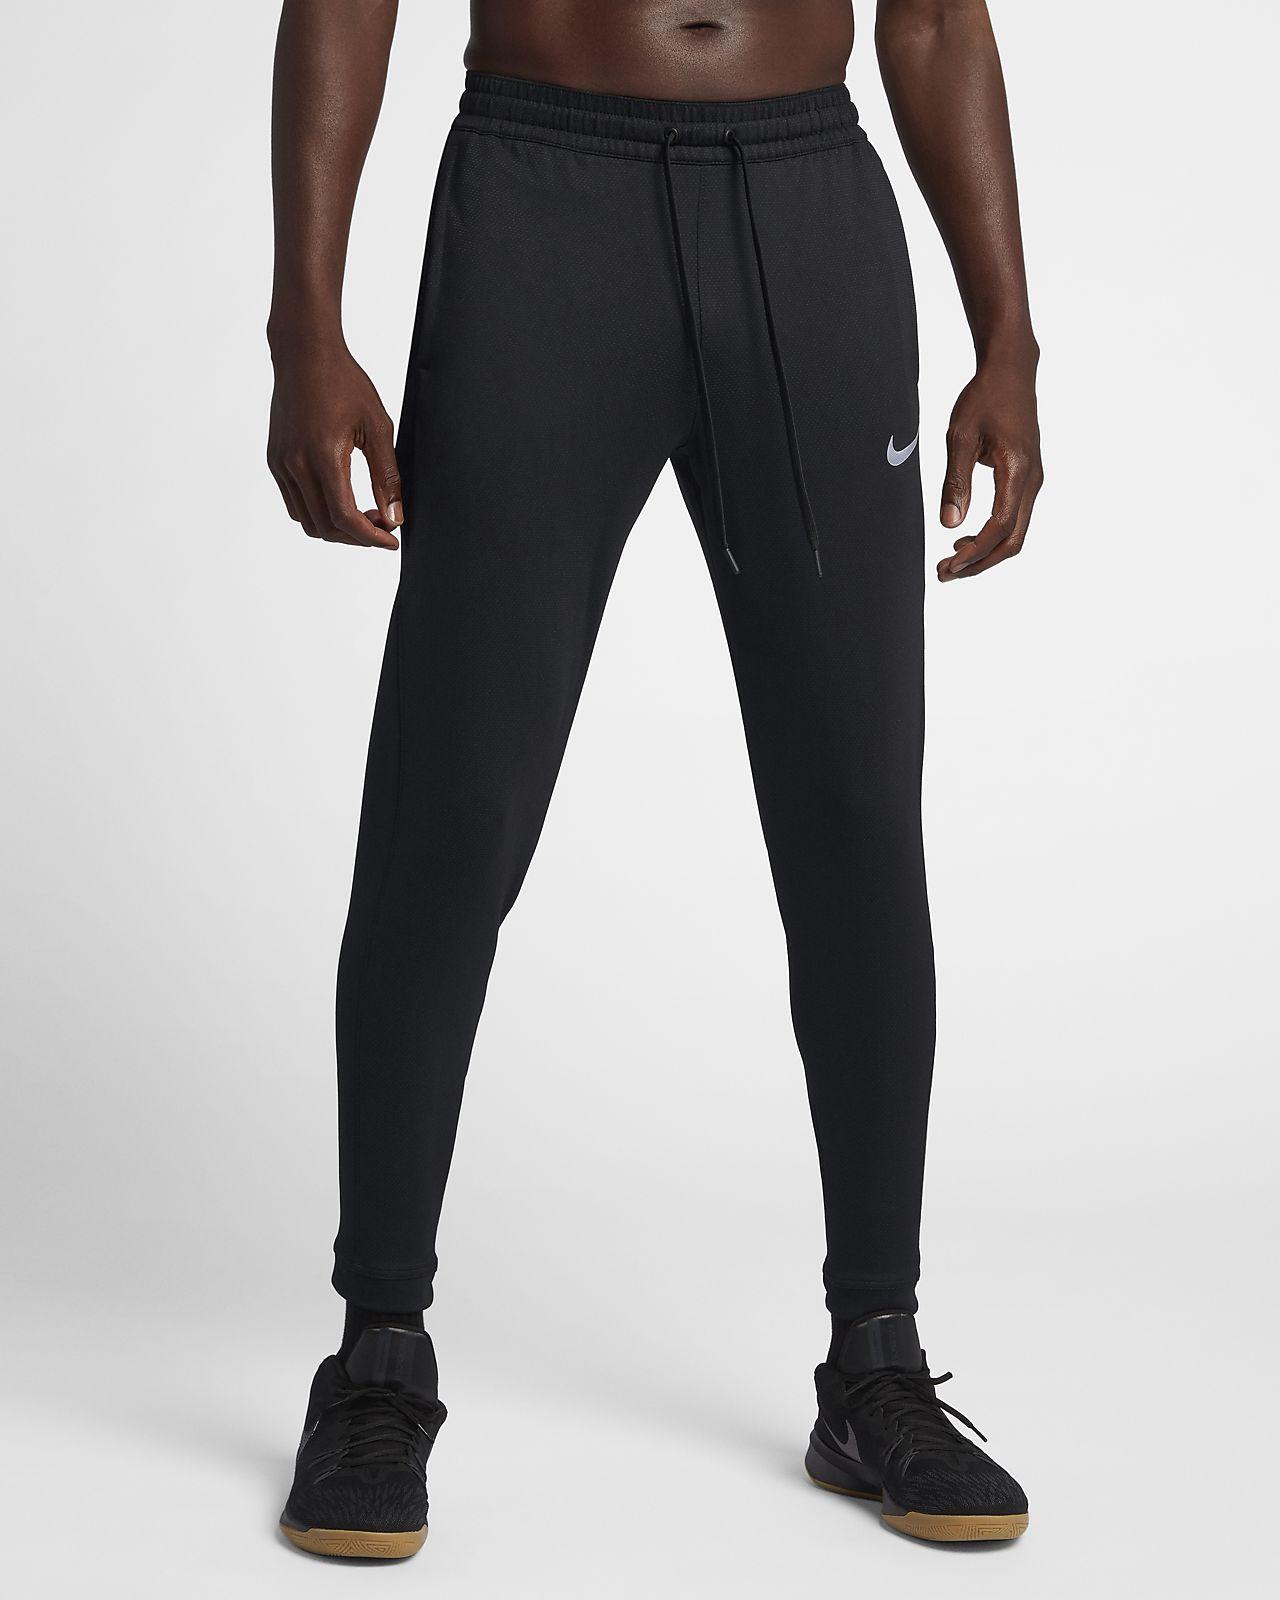 Pantaloni da basket Nike Therma Flex Showtime - Uomo